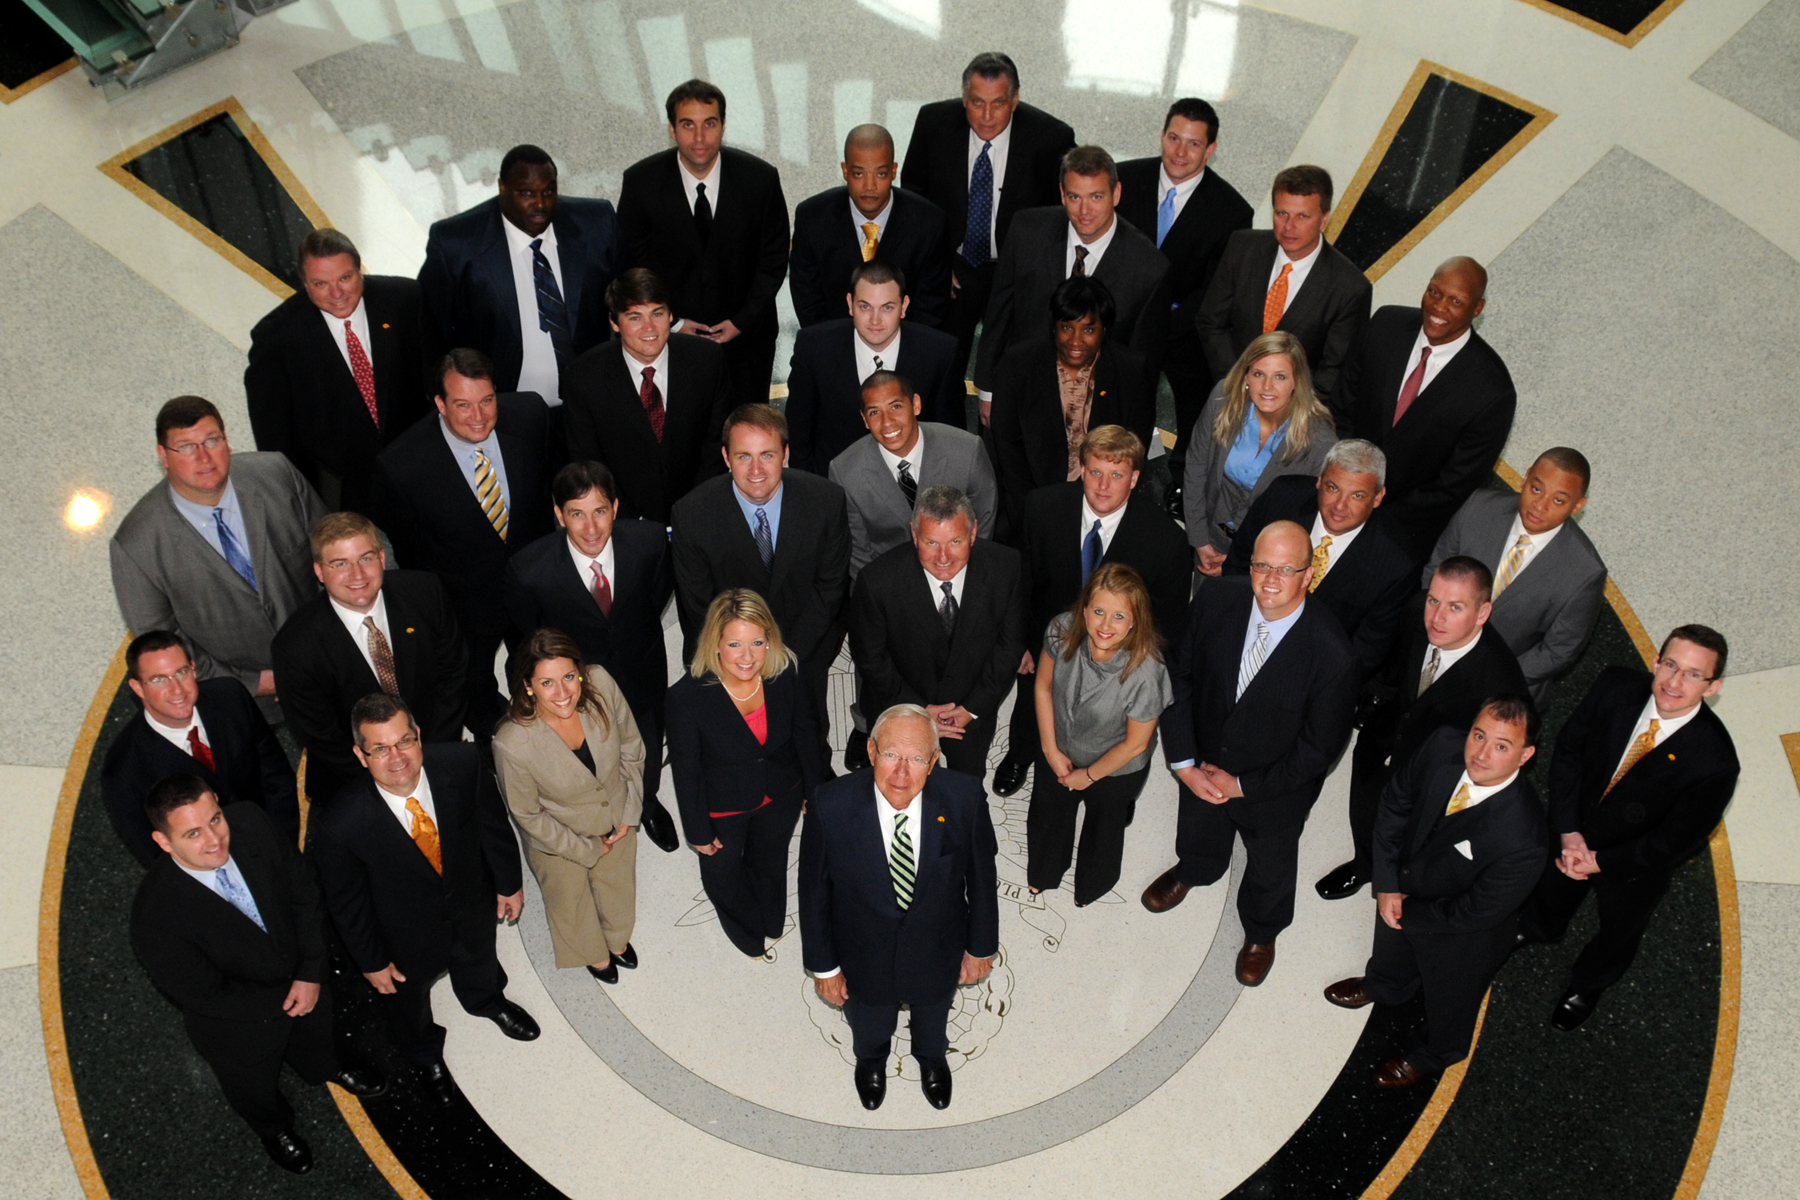 Cintas Corp  Founder Recognized as Boardman Entrepreneur of Year